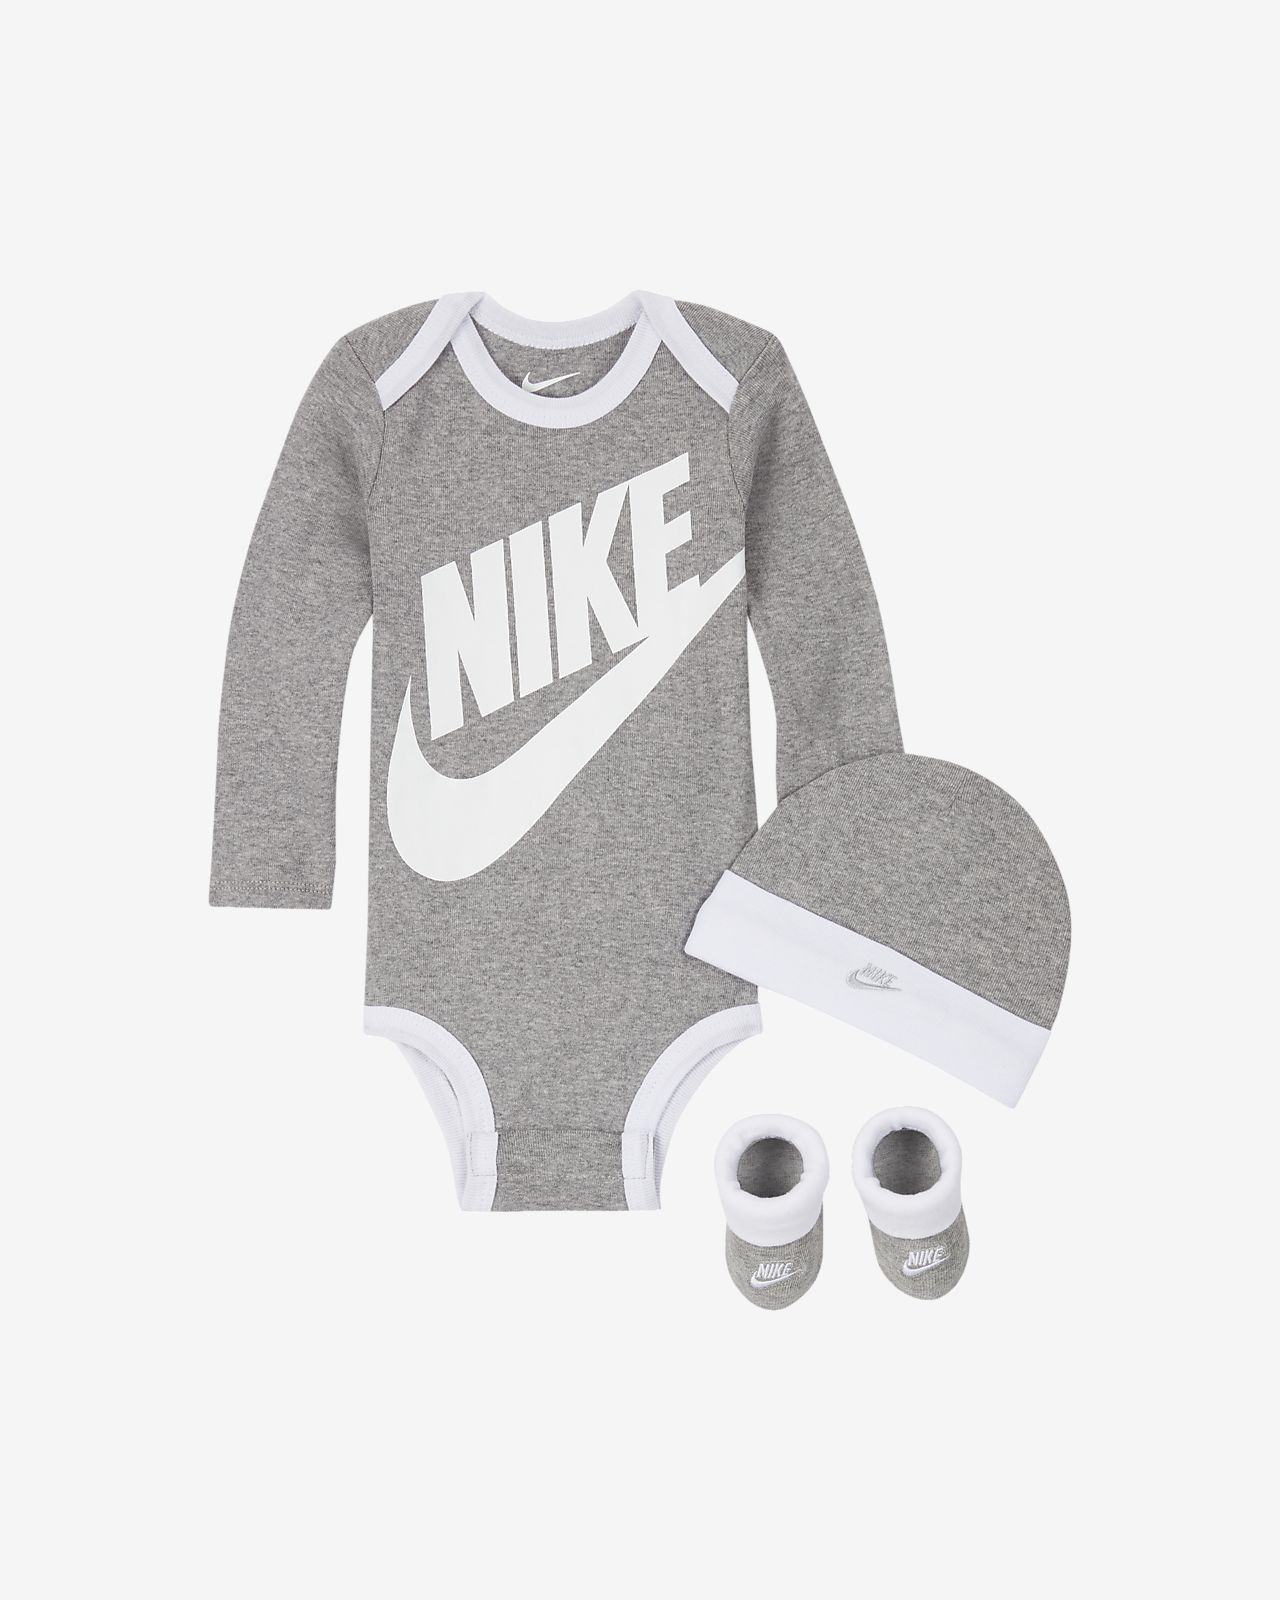 Conjunto de body, gorro y calzado para bebés Nike (6 a 12 meses)